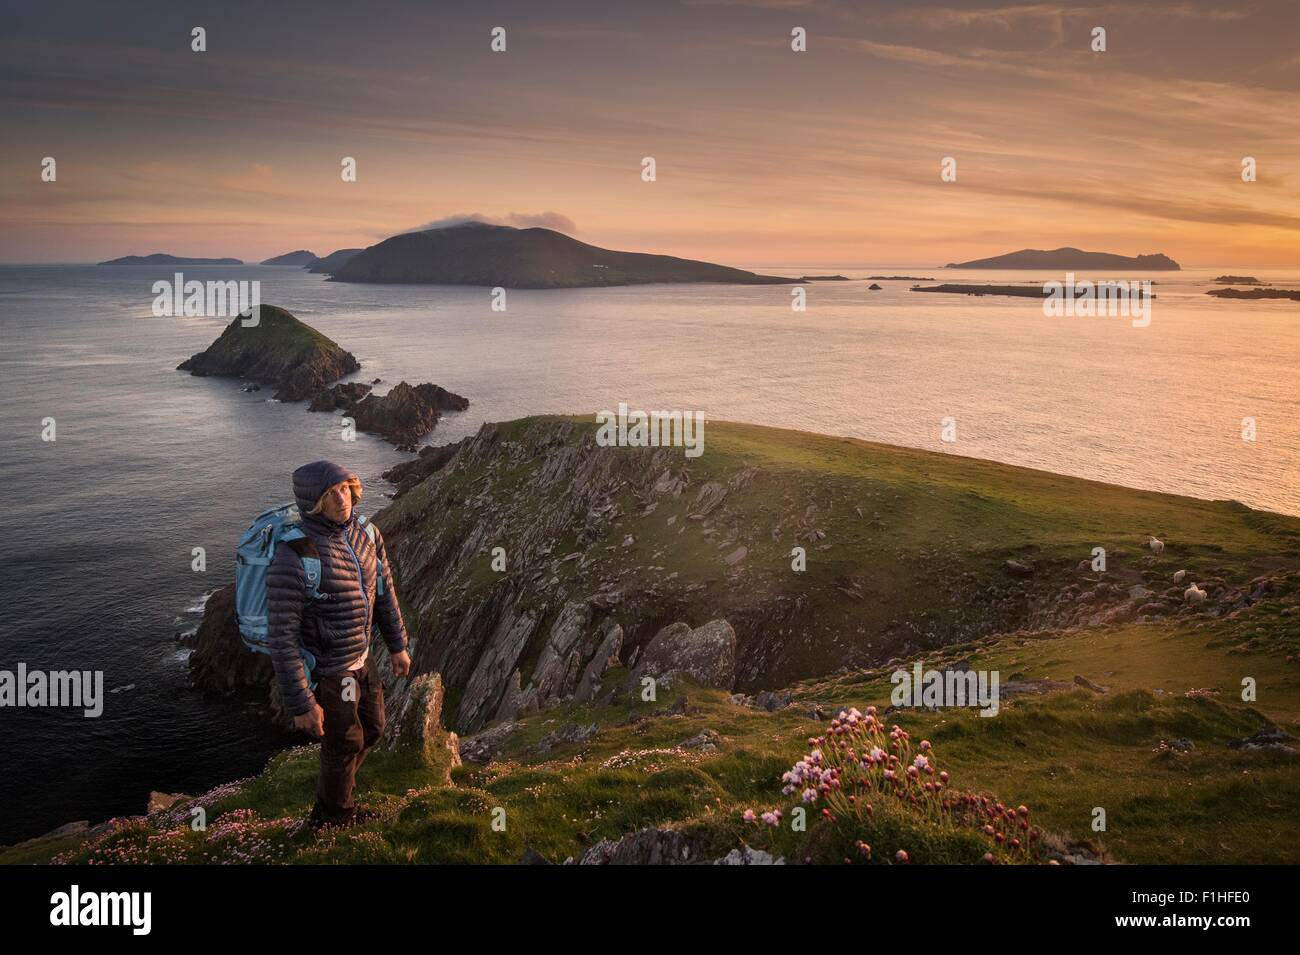 Mid adult man, hiking, Slea head, County Kerry, Ireland - Stock Image